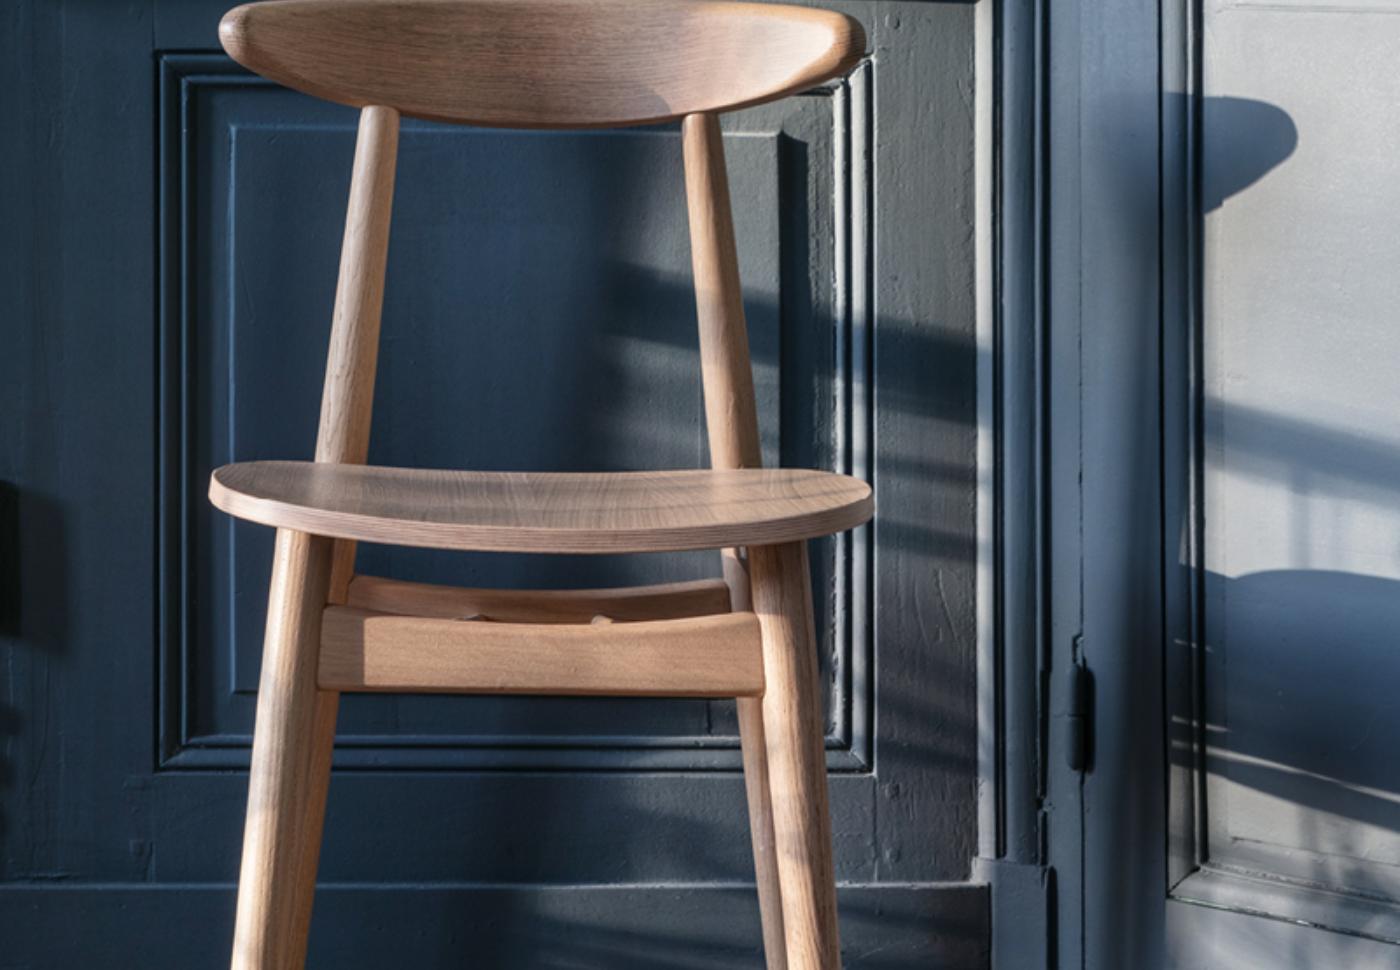 W800h1000zc Z Cq85 Vincent Sheppard Teo Oak dining chair